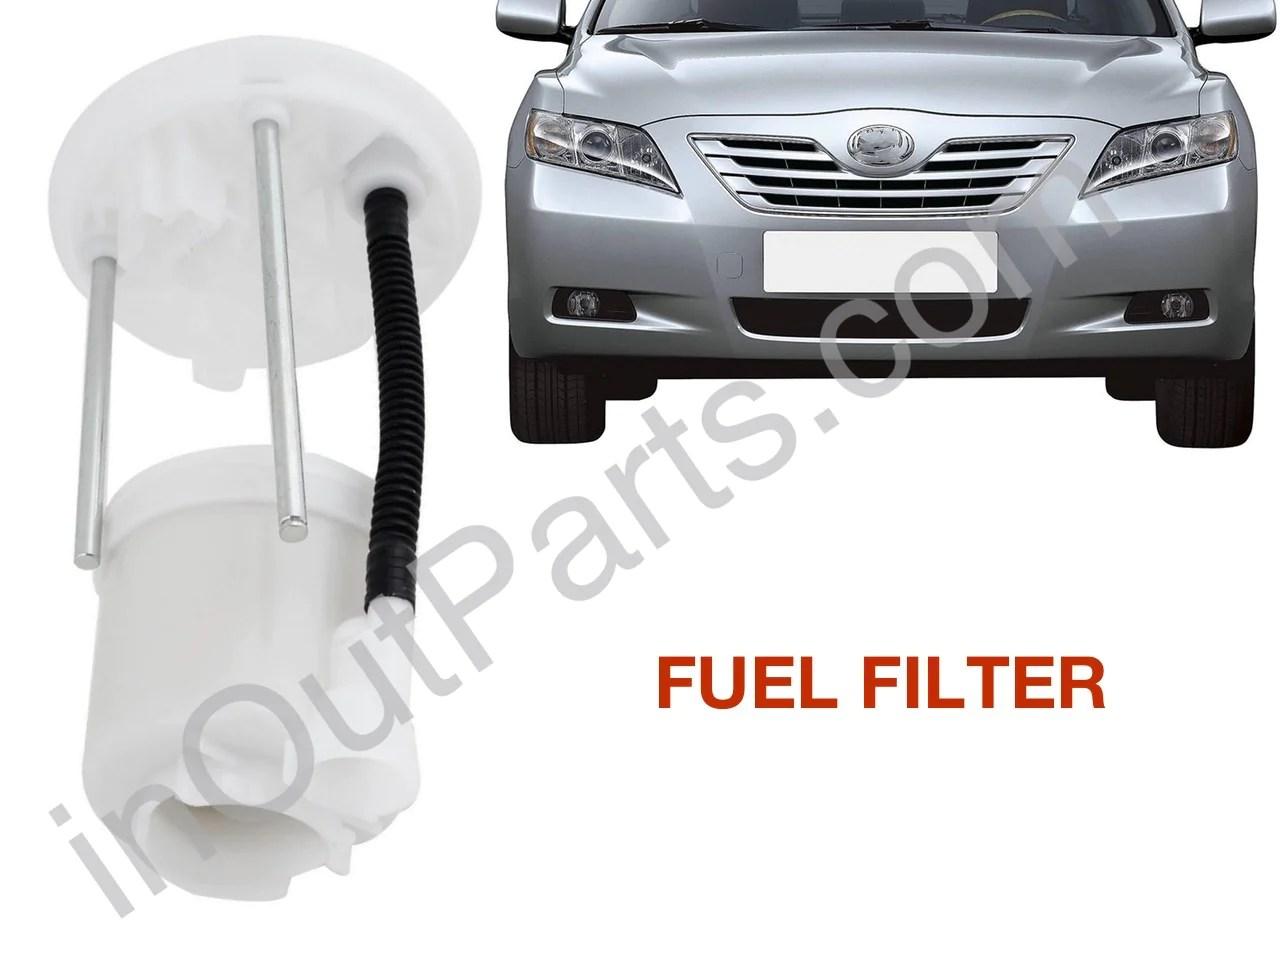 hight resolution of 2007 pontiac grand prix fuel filter